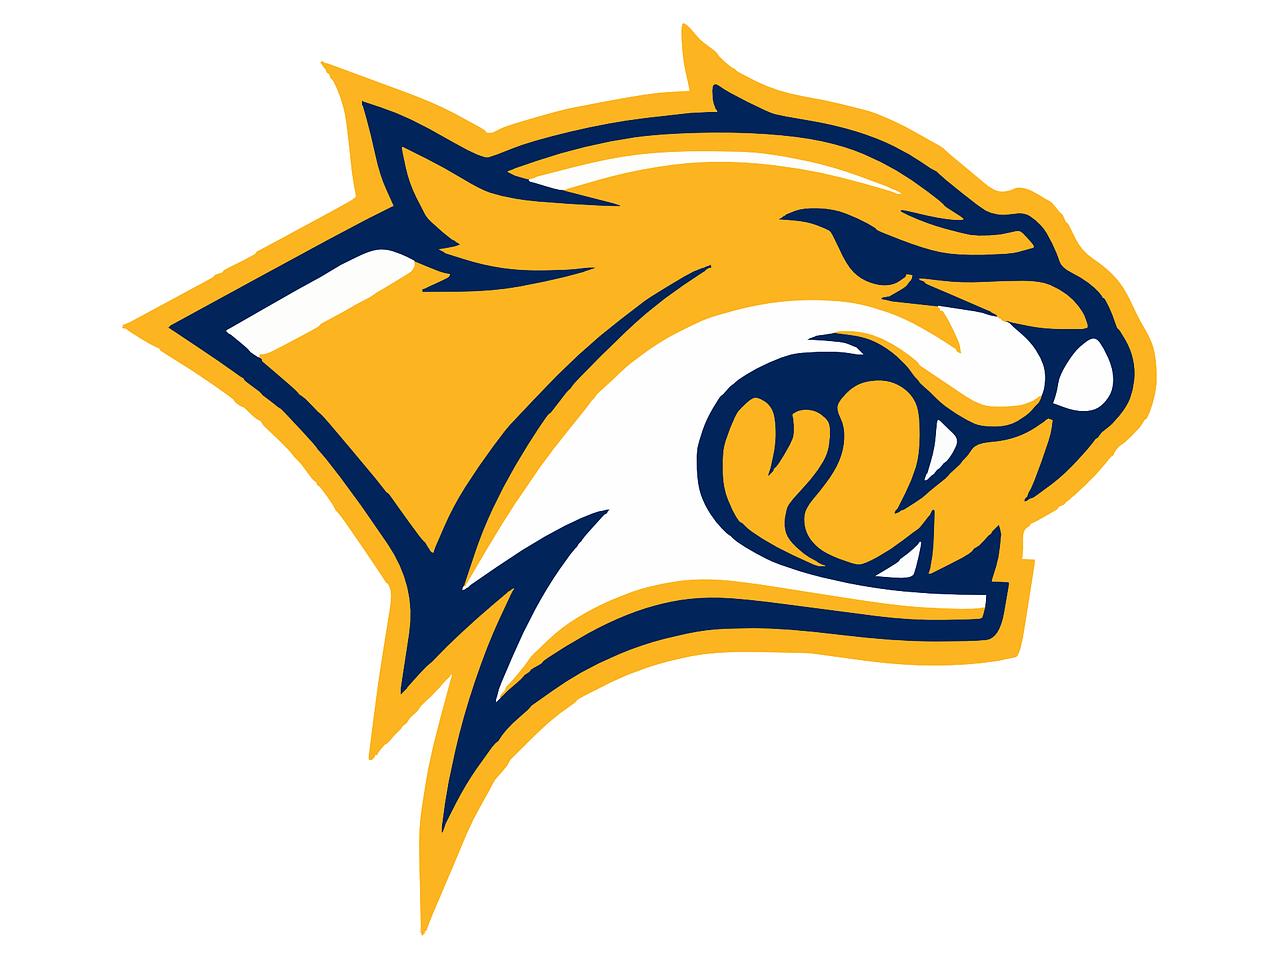 team-yellow-logo